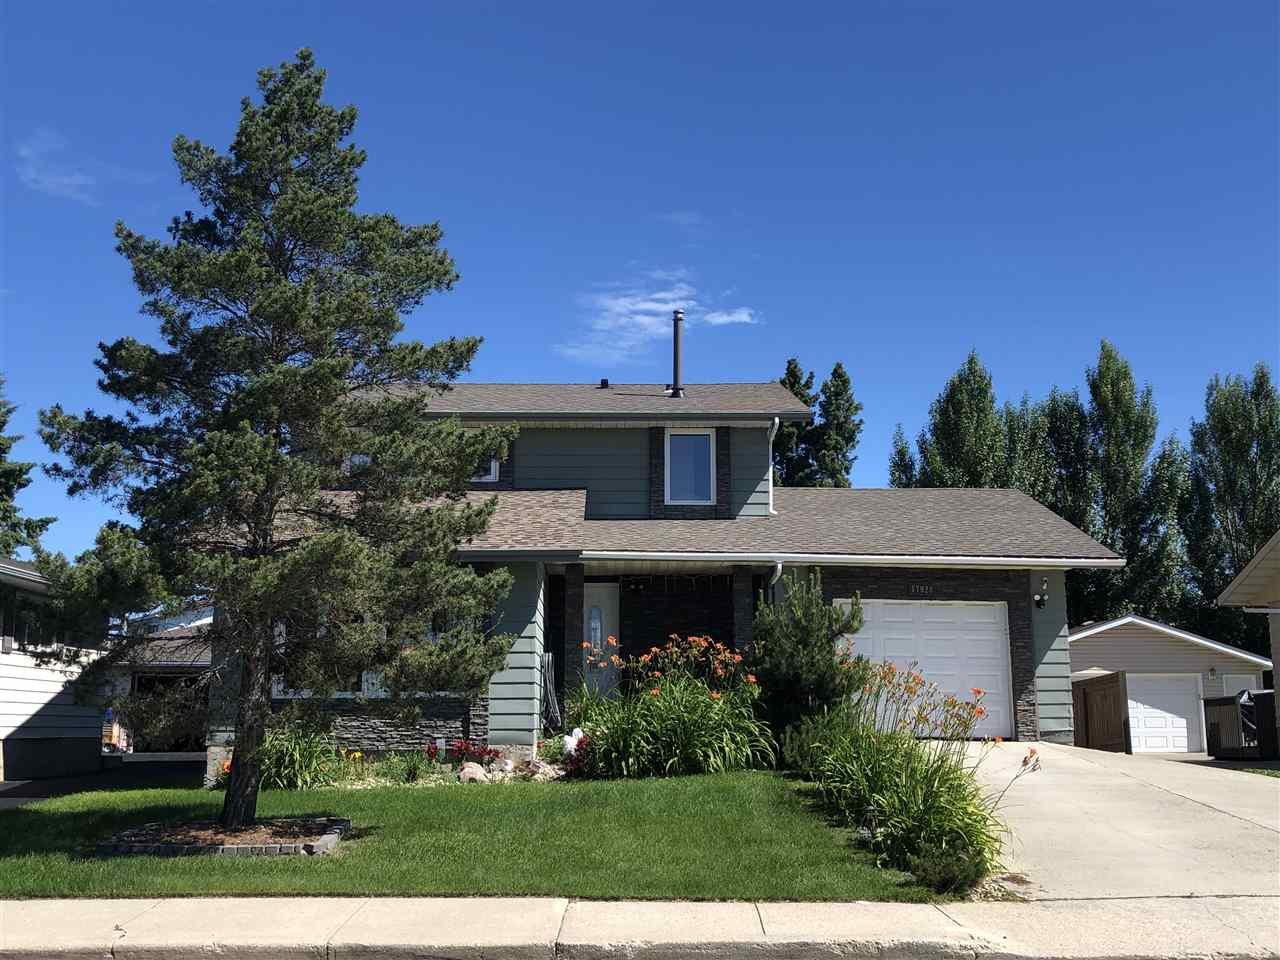 Main Photo: 17928 93 Avenue in Edmonton: Zone 20 House for sale : MLS®# E4208980